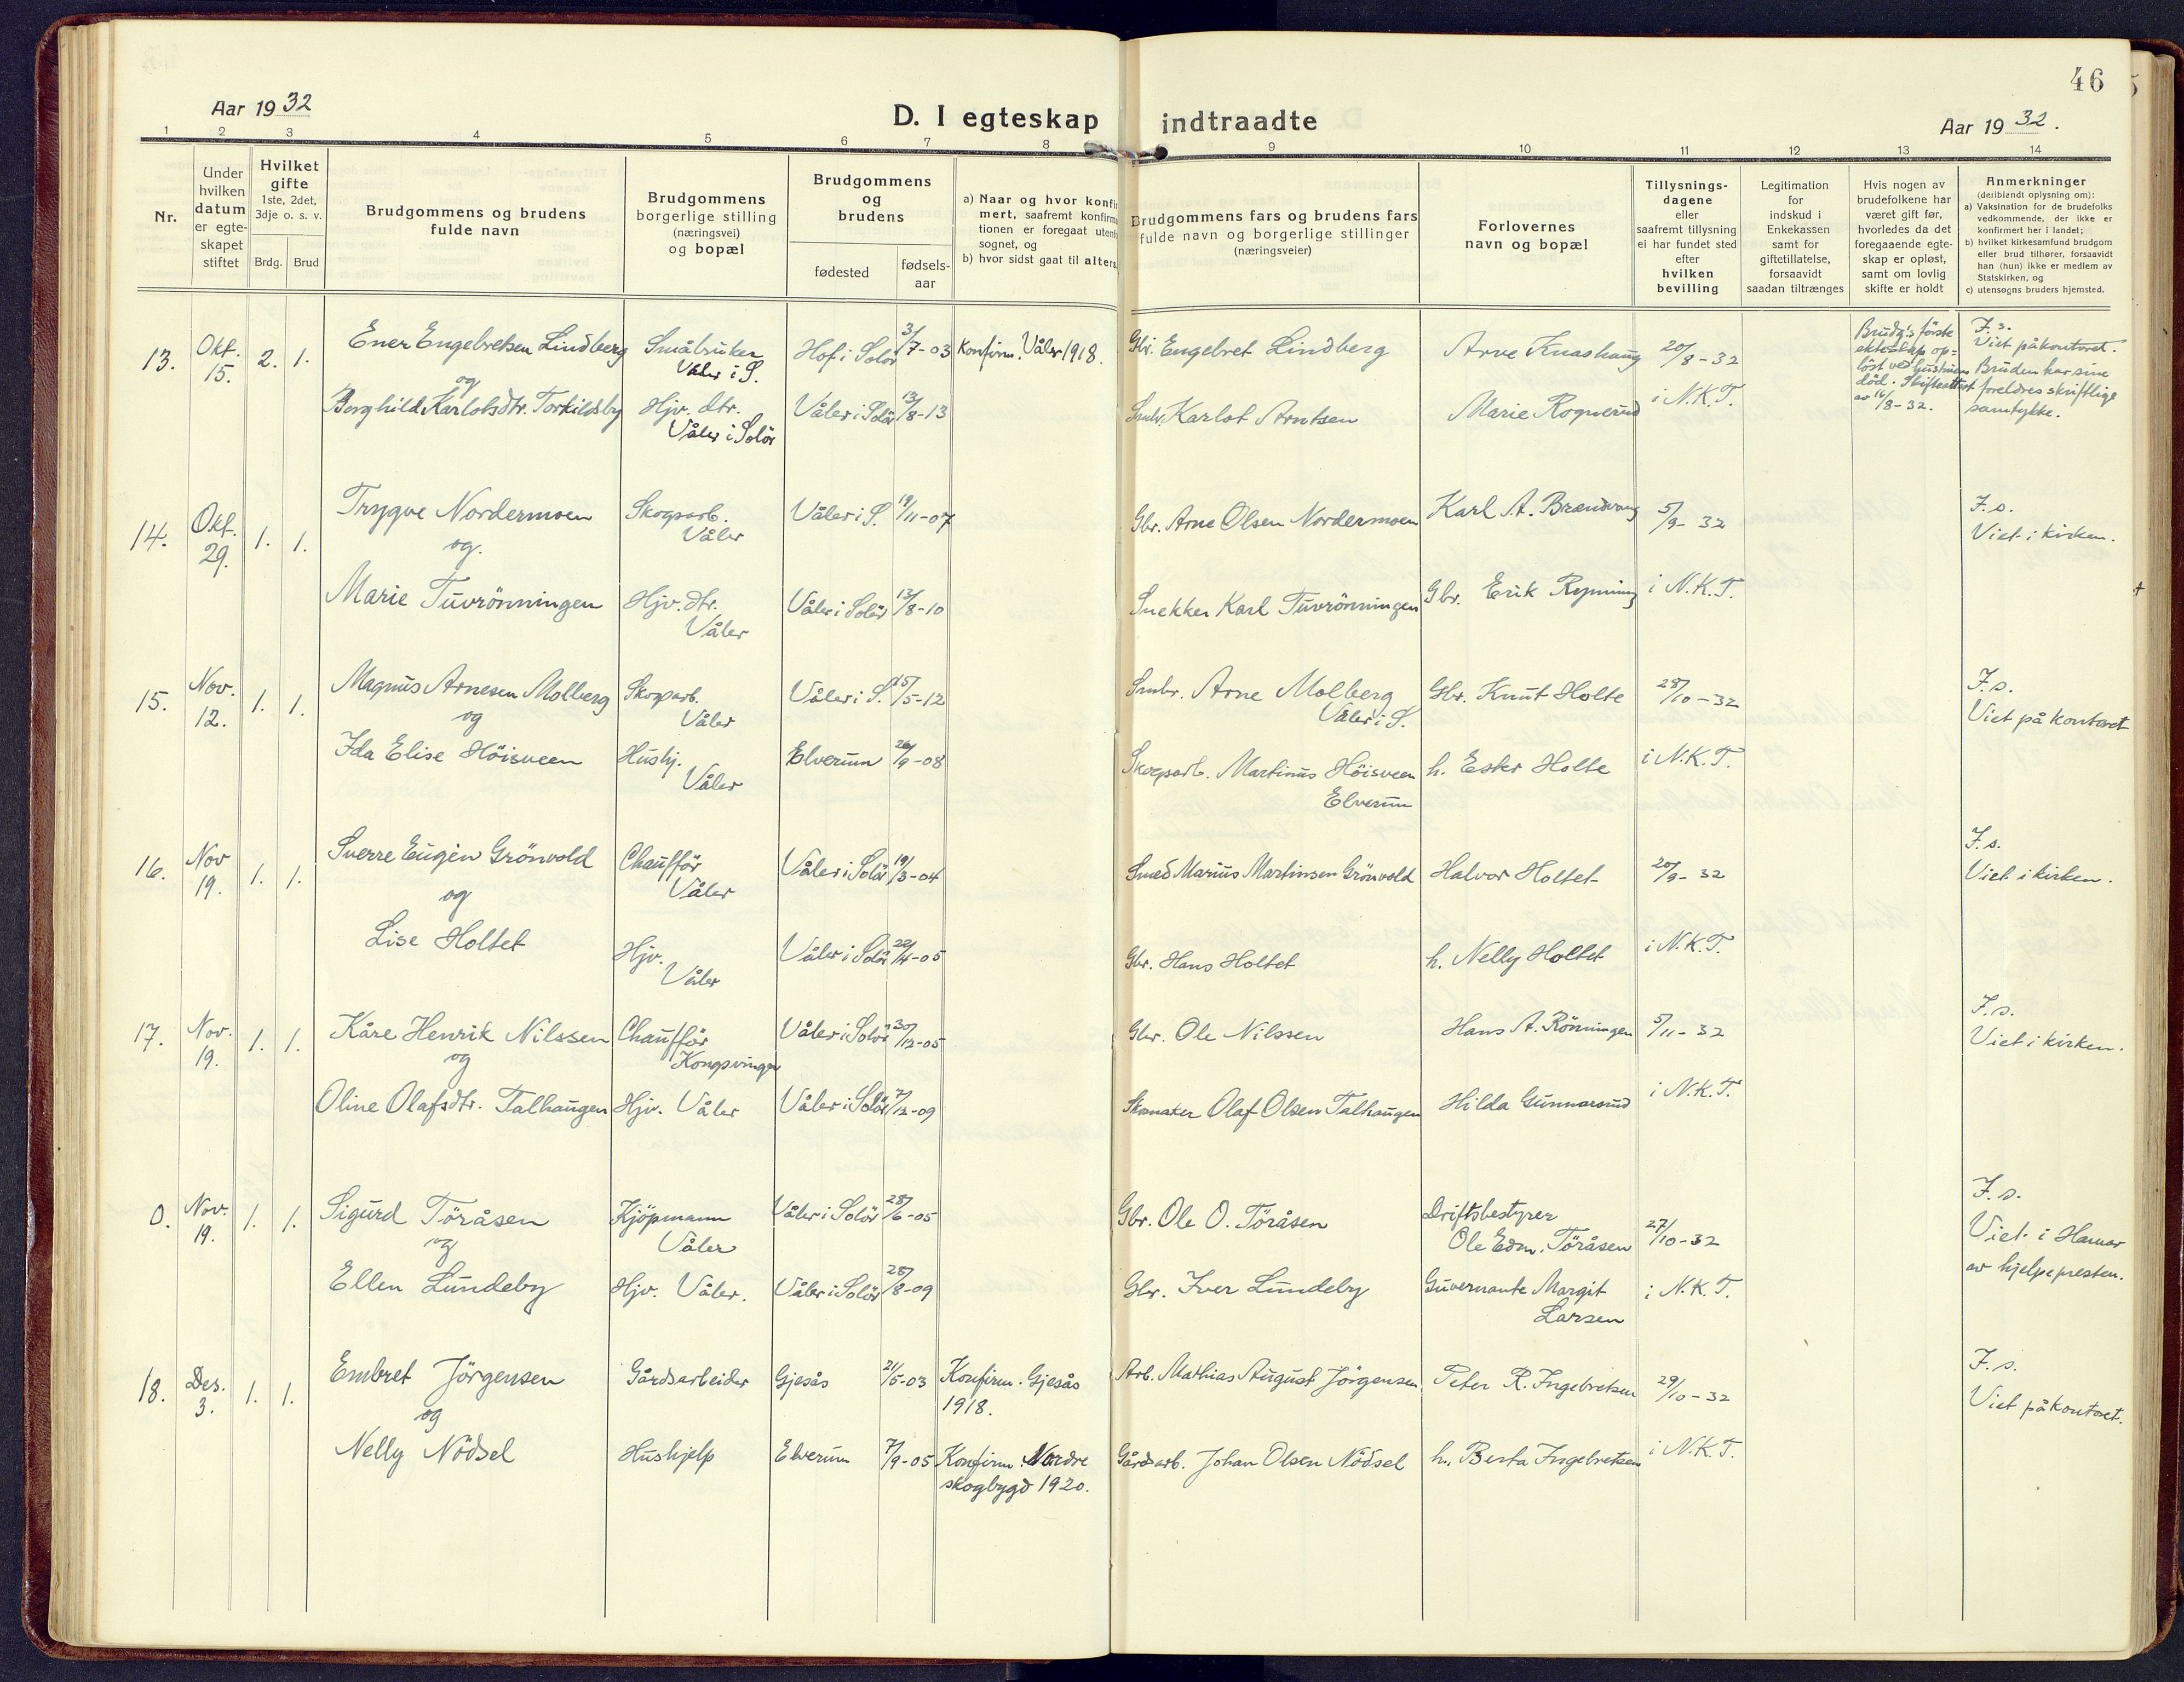 SAH, Våler prestekontor, Ministerialbok nr. 11, 1919-1933, s. 46